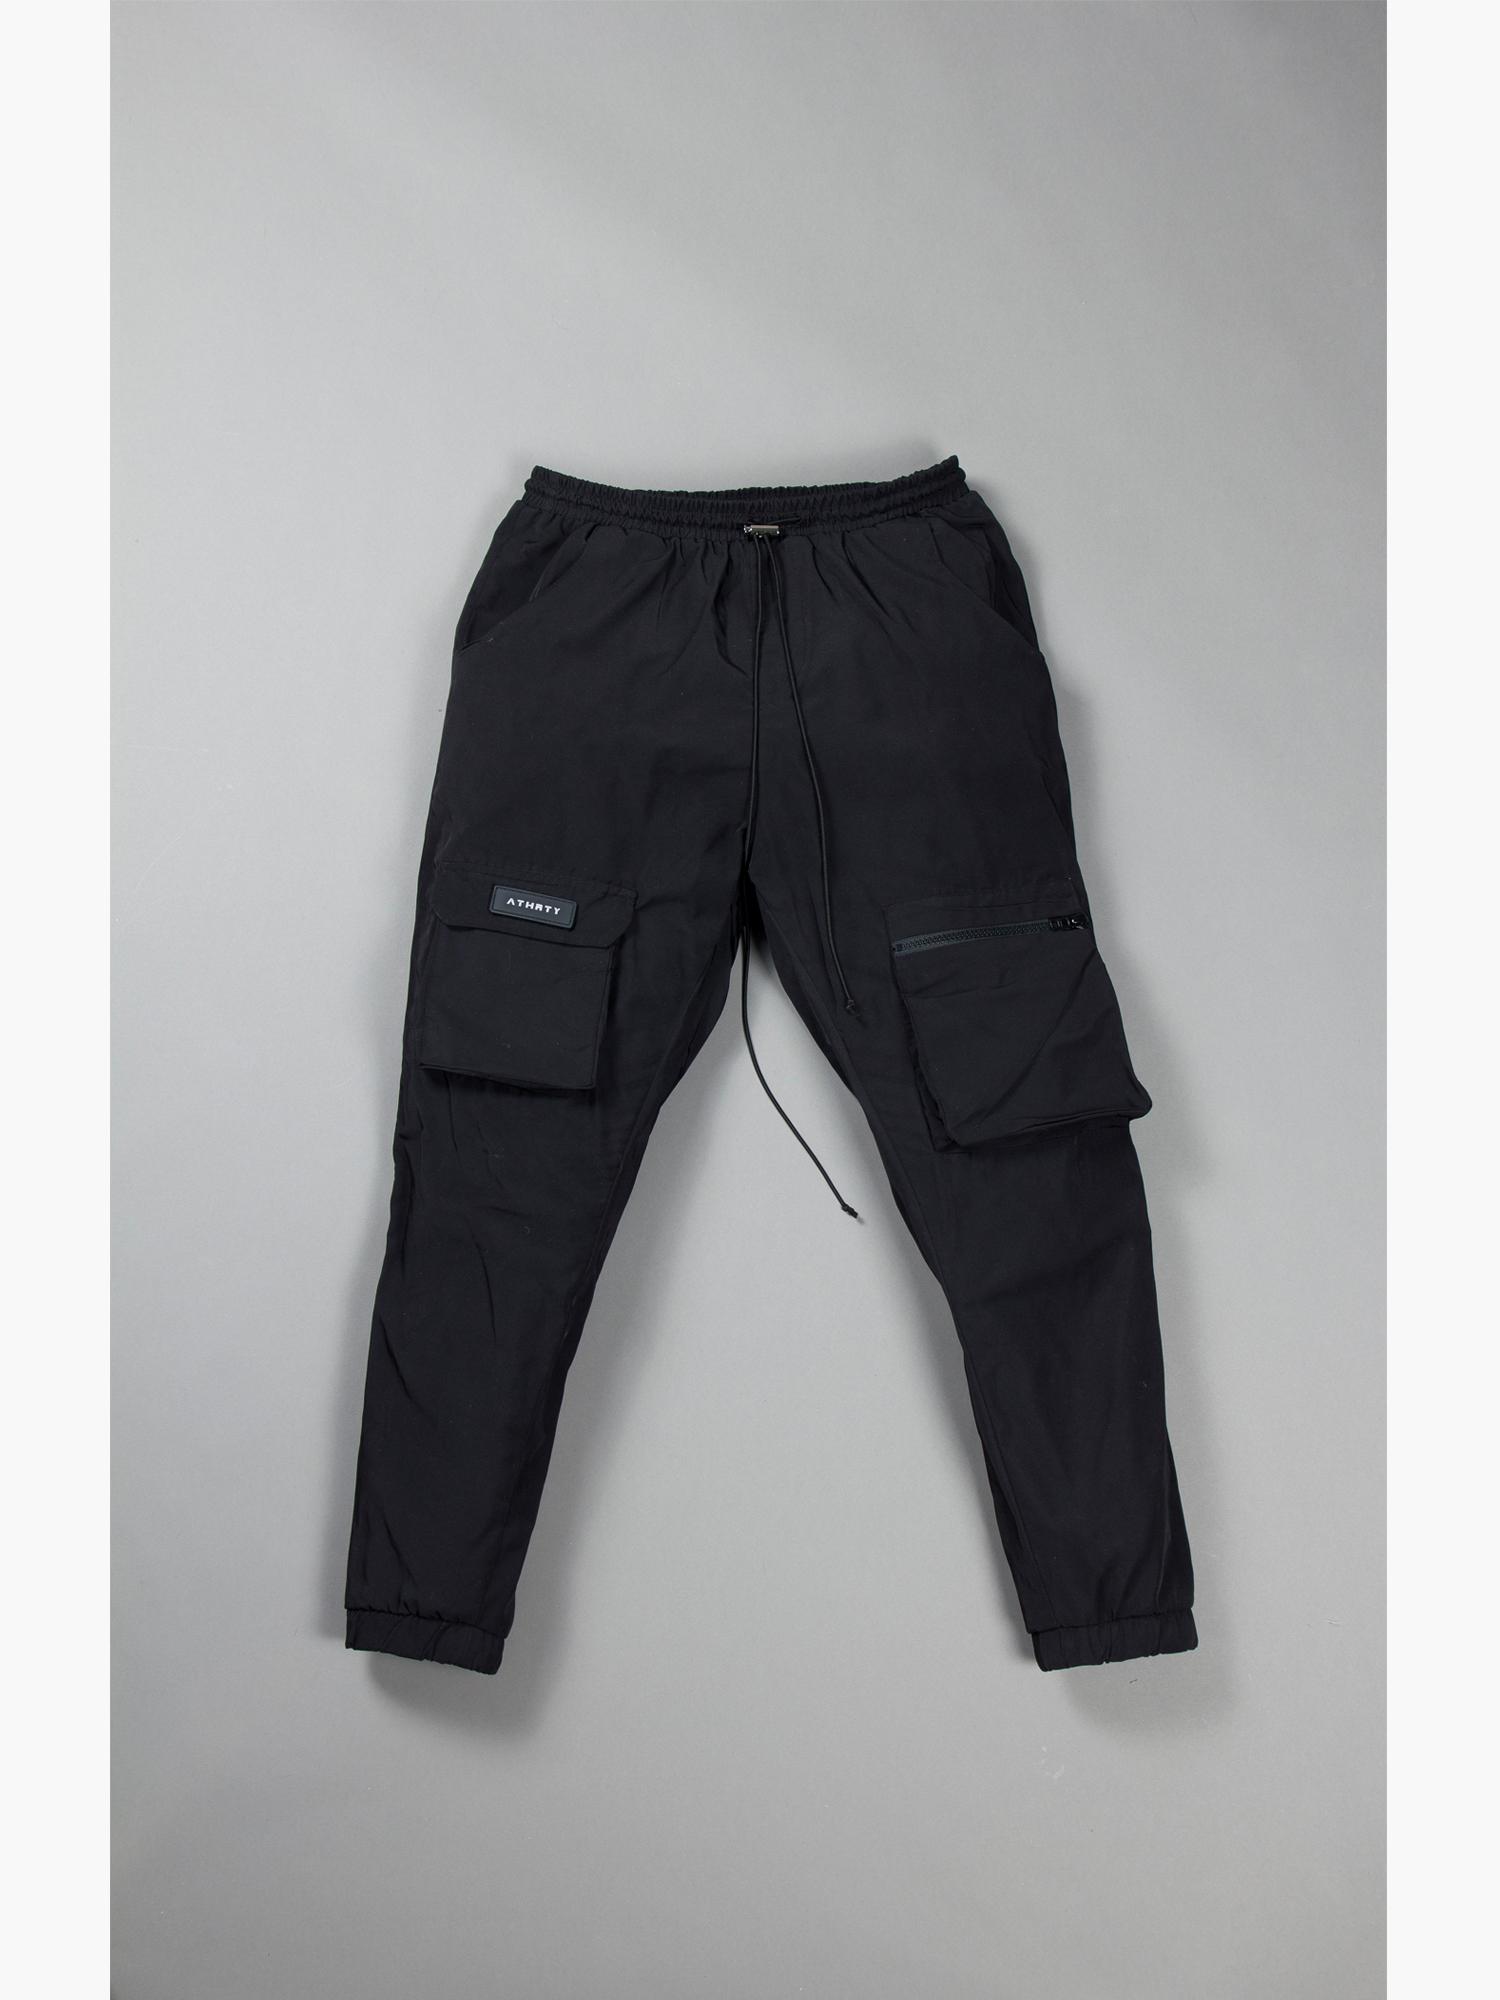 ATHRTY_cupid_pants_black_f1